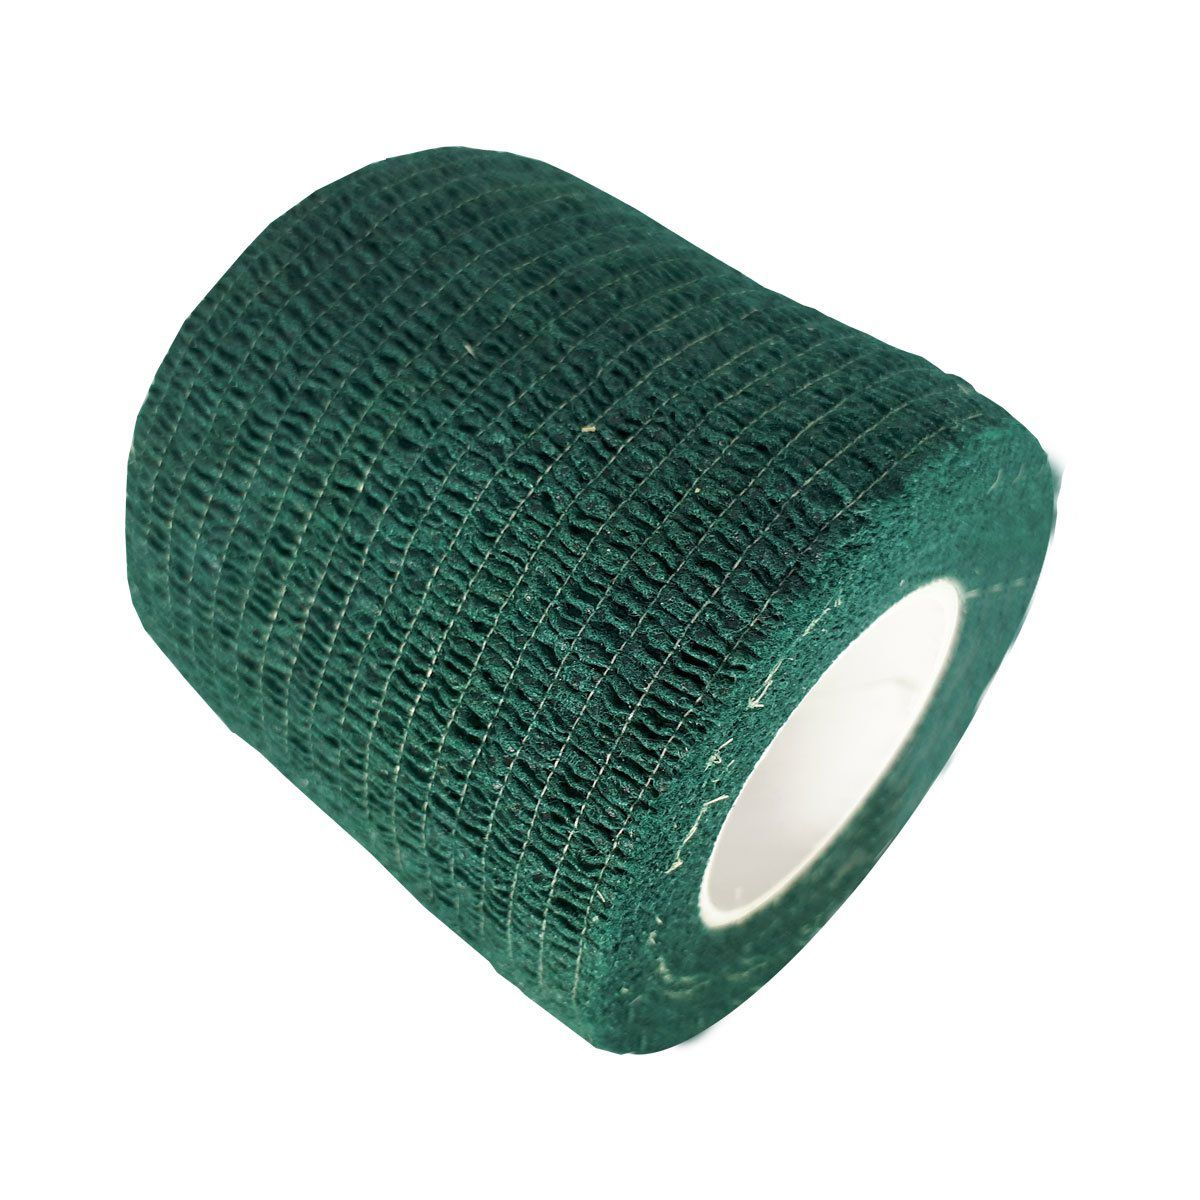 Fita P/ Camuflagem Albatroz Camo Tape FT-GREEN 5 Mts Verde